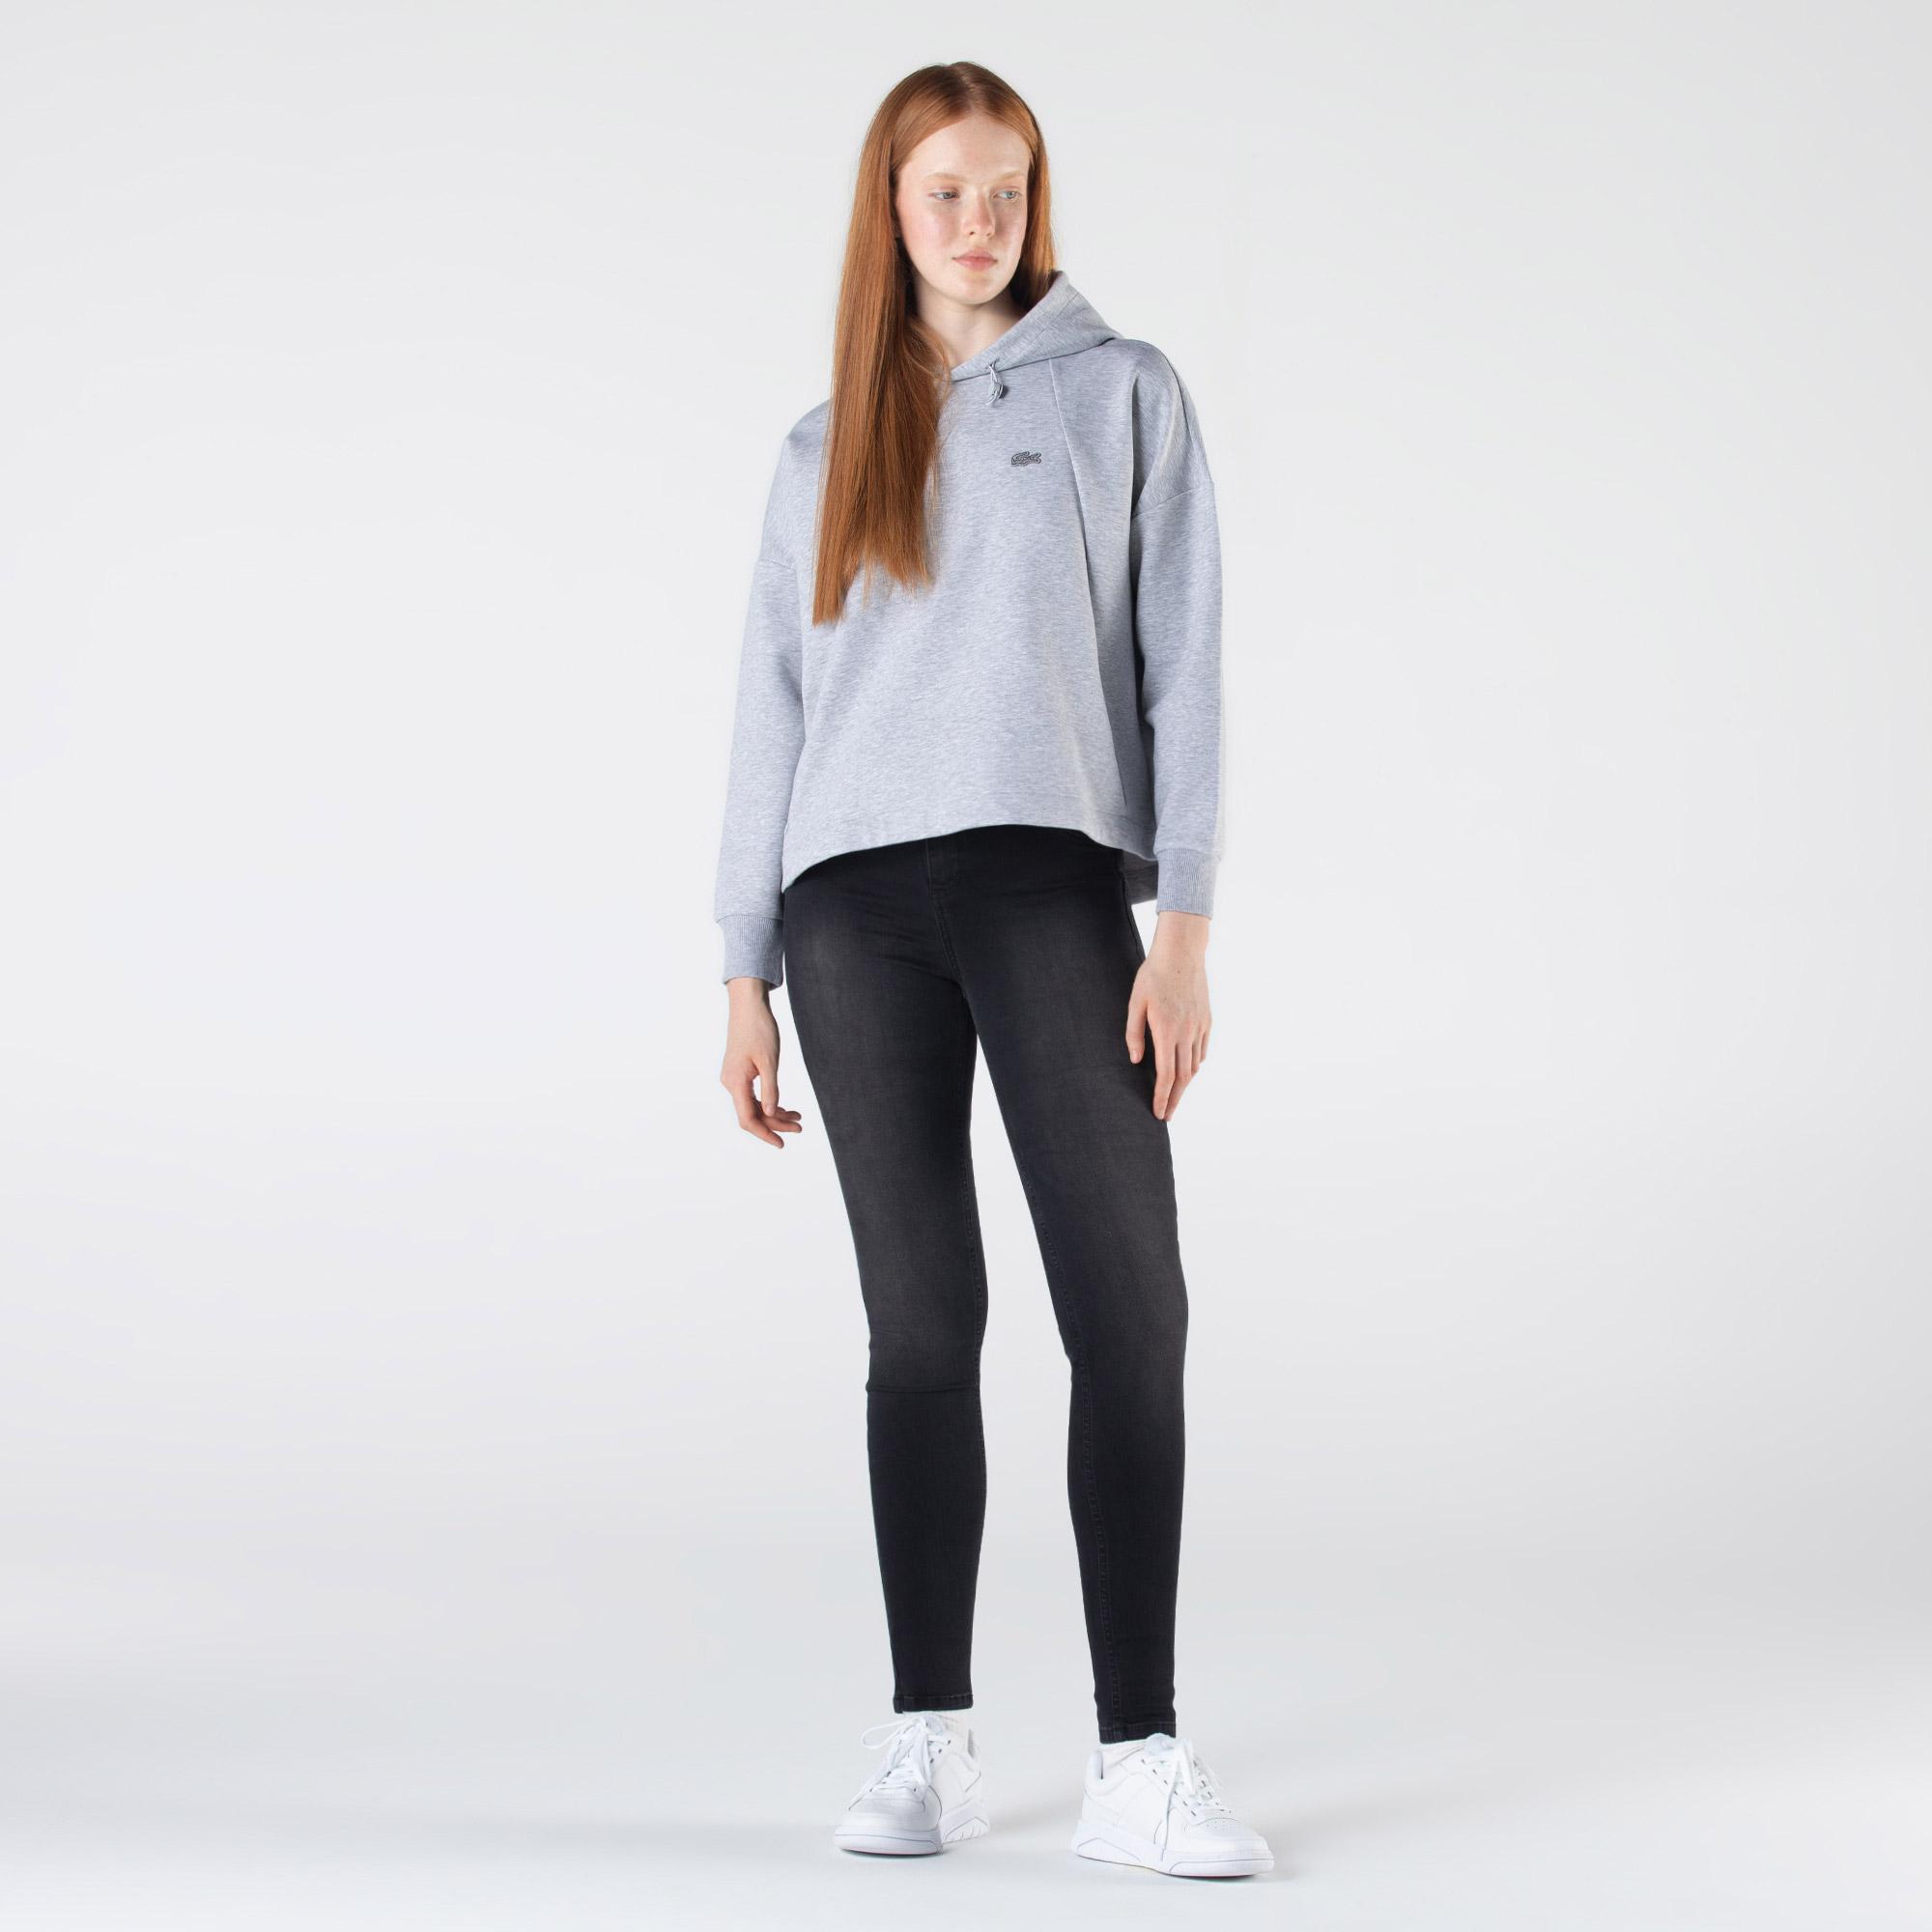 Lacoste Spodnie damskie